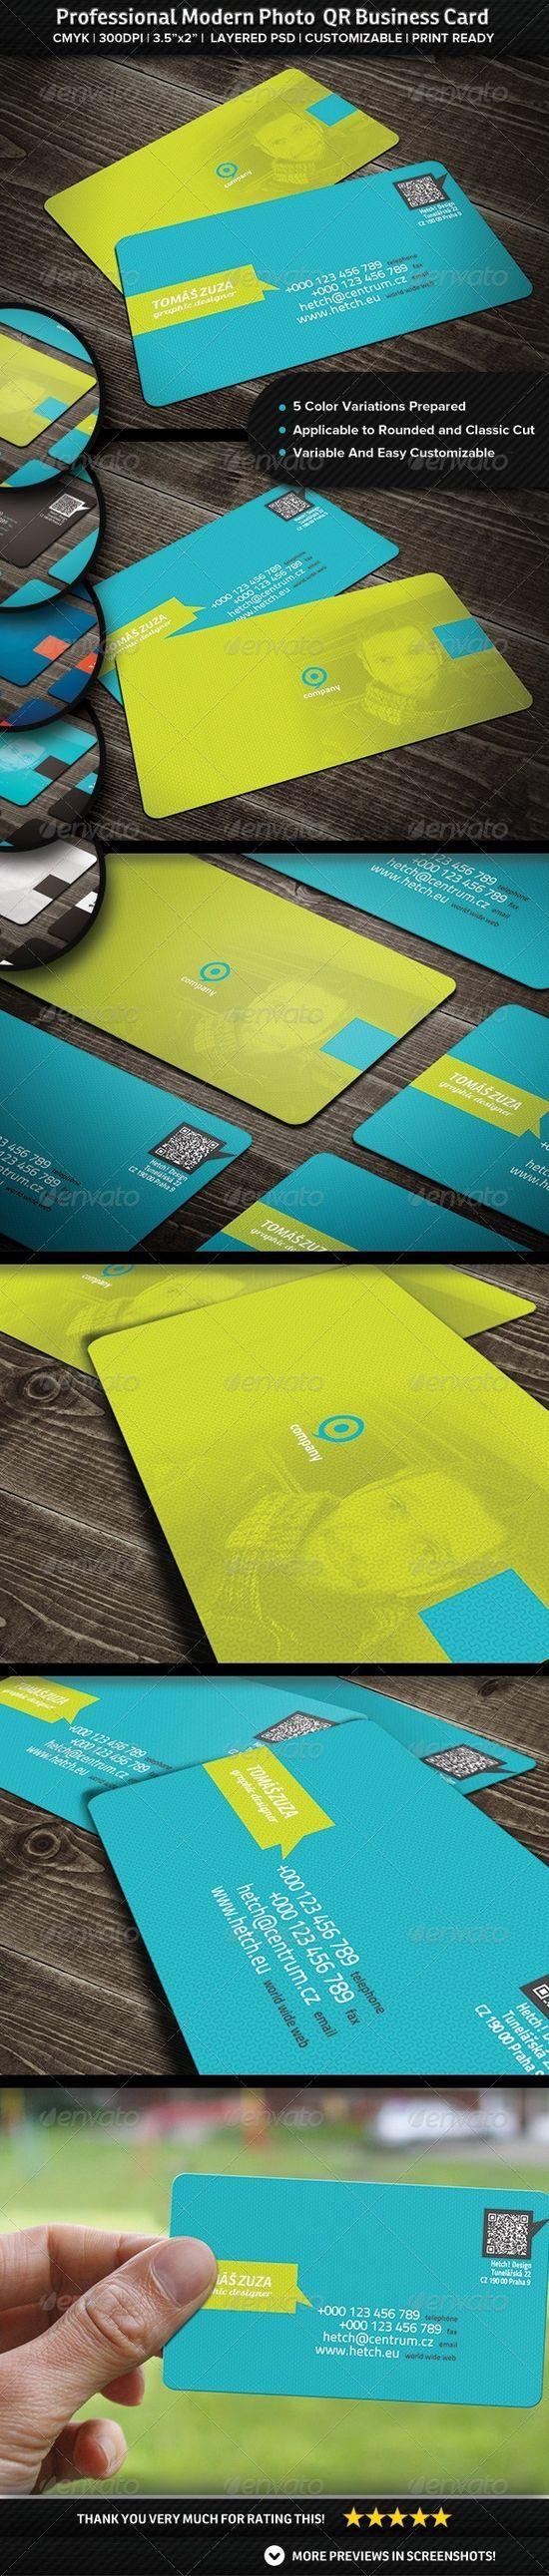 Professional Modern Photo QR Business Card